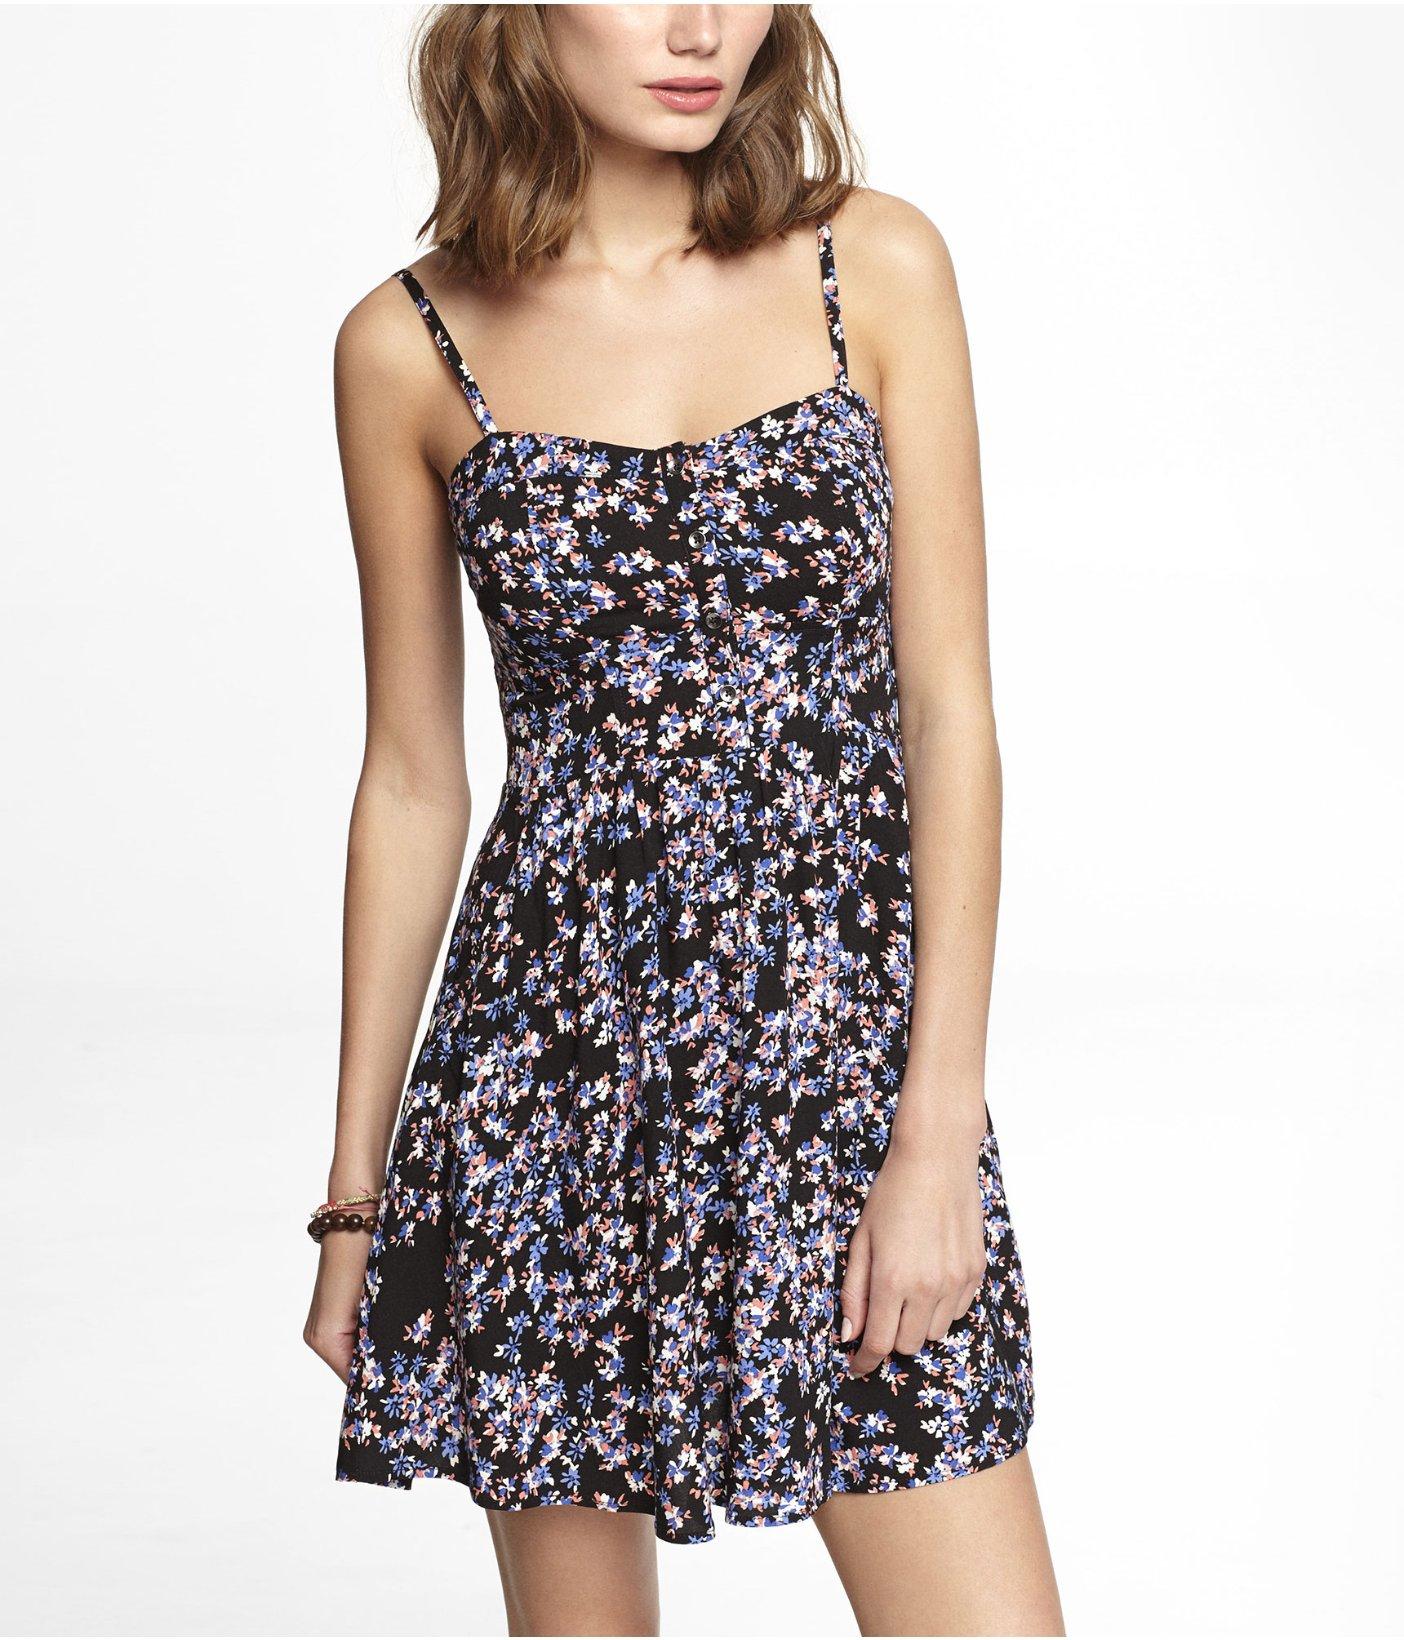 093286a8d95 Express Floral Cami Sundress in Blue - Lyst